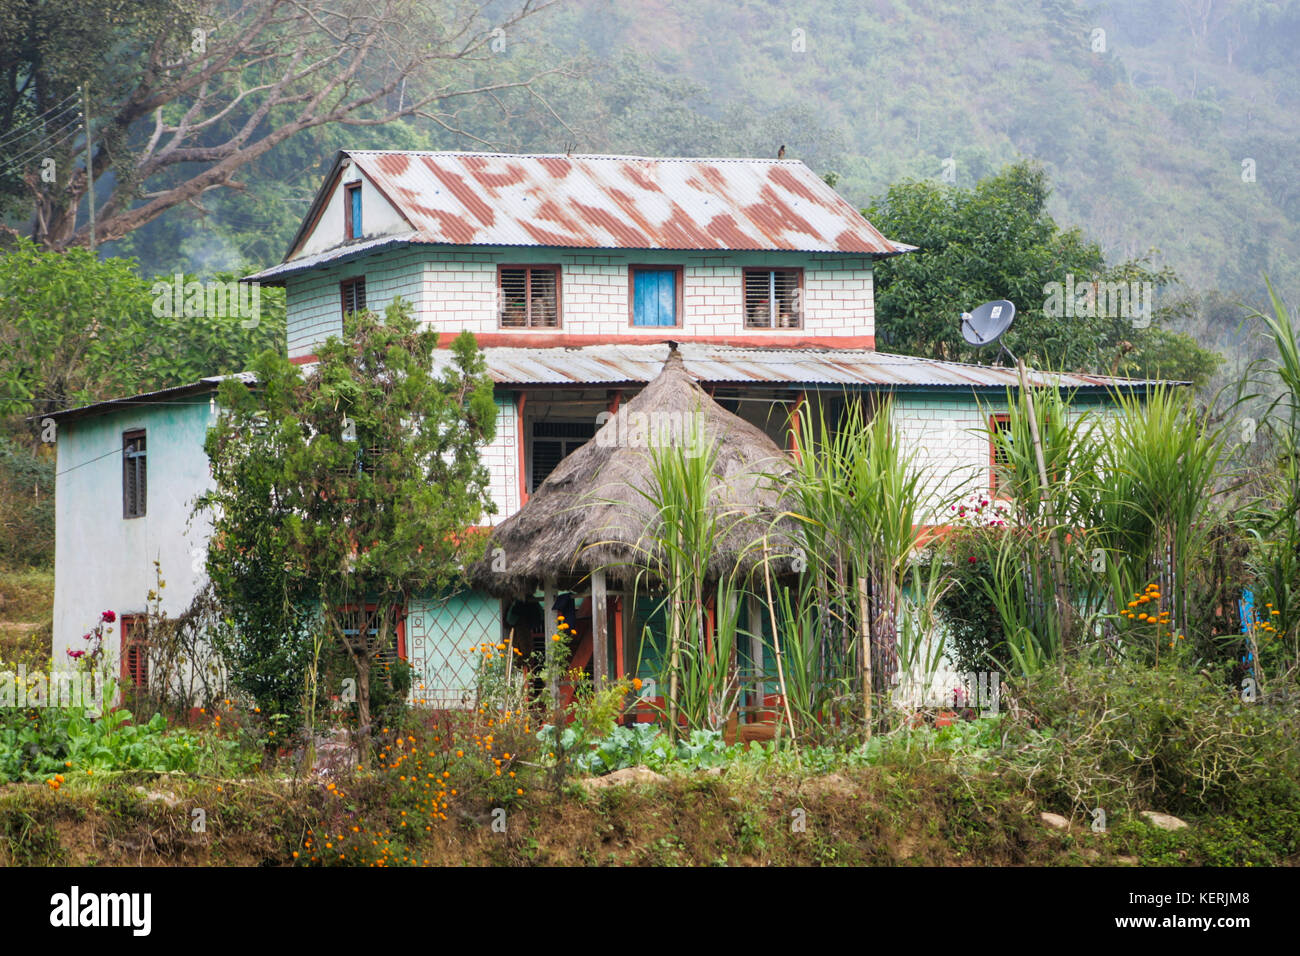 Nepali Village House Stock Photos Nepali Village House